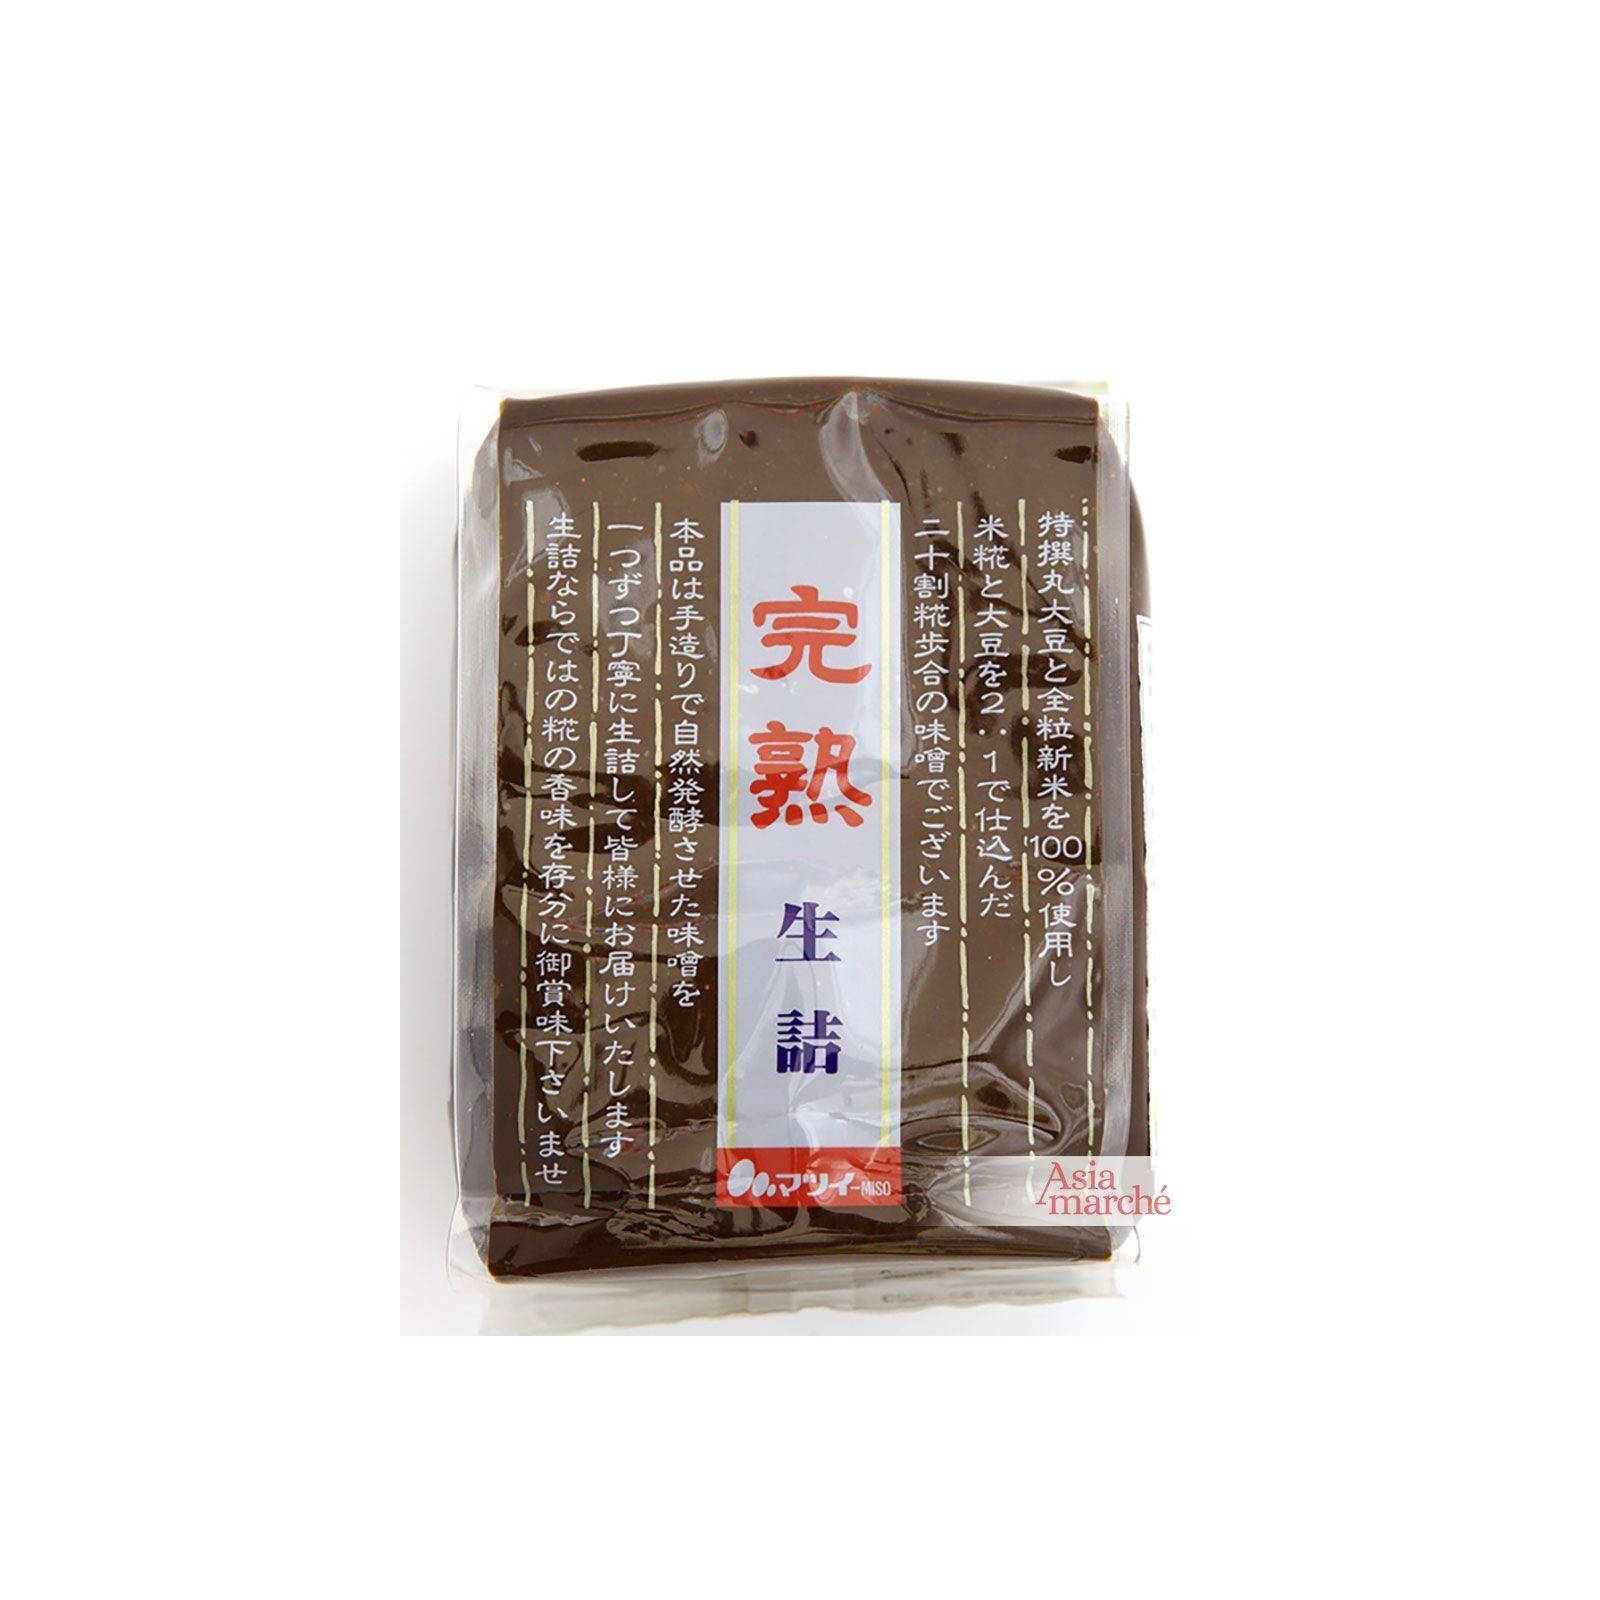 Asia Marché Miso brun inaka 1kg